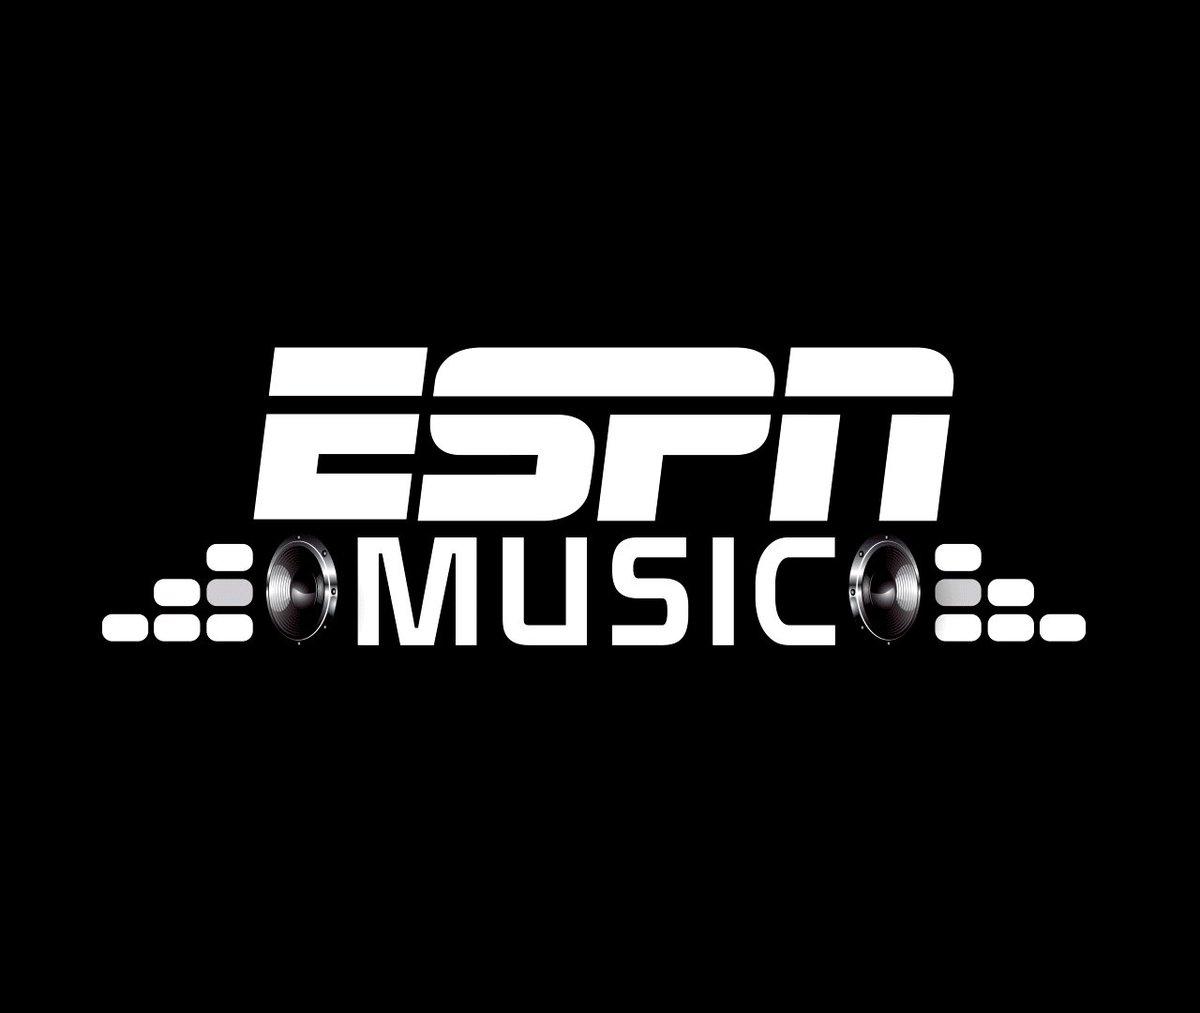 RT @ESPNMusic: Check out #Dose all month @espn @ciara https://t.co/xXwrsNw6Or